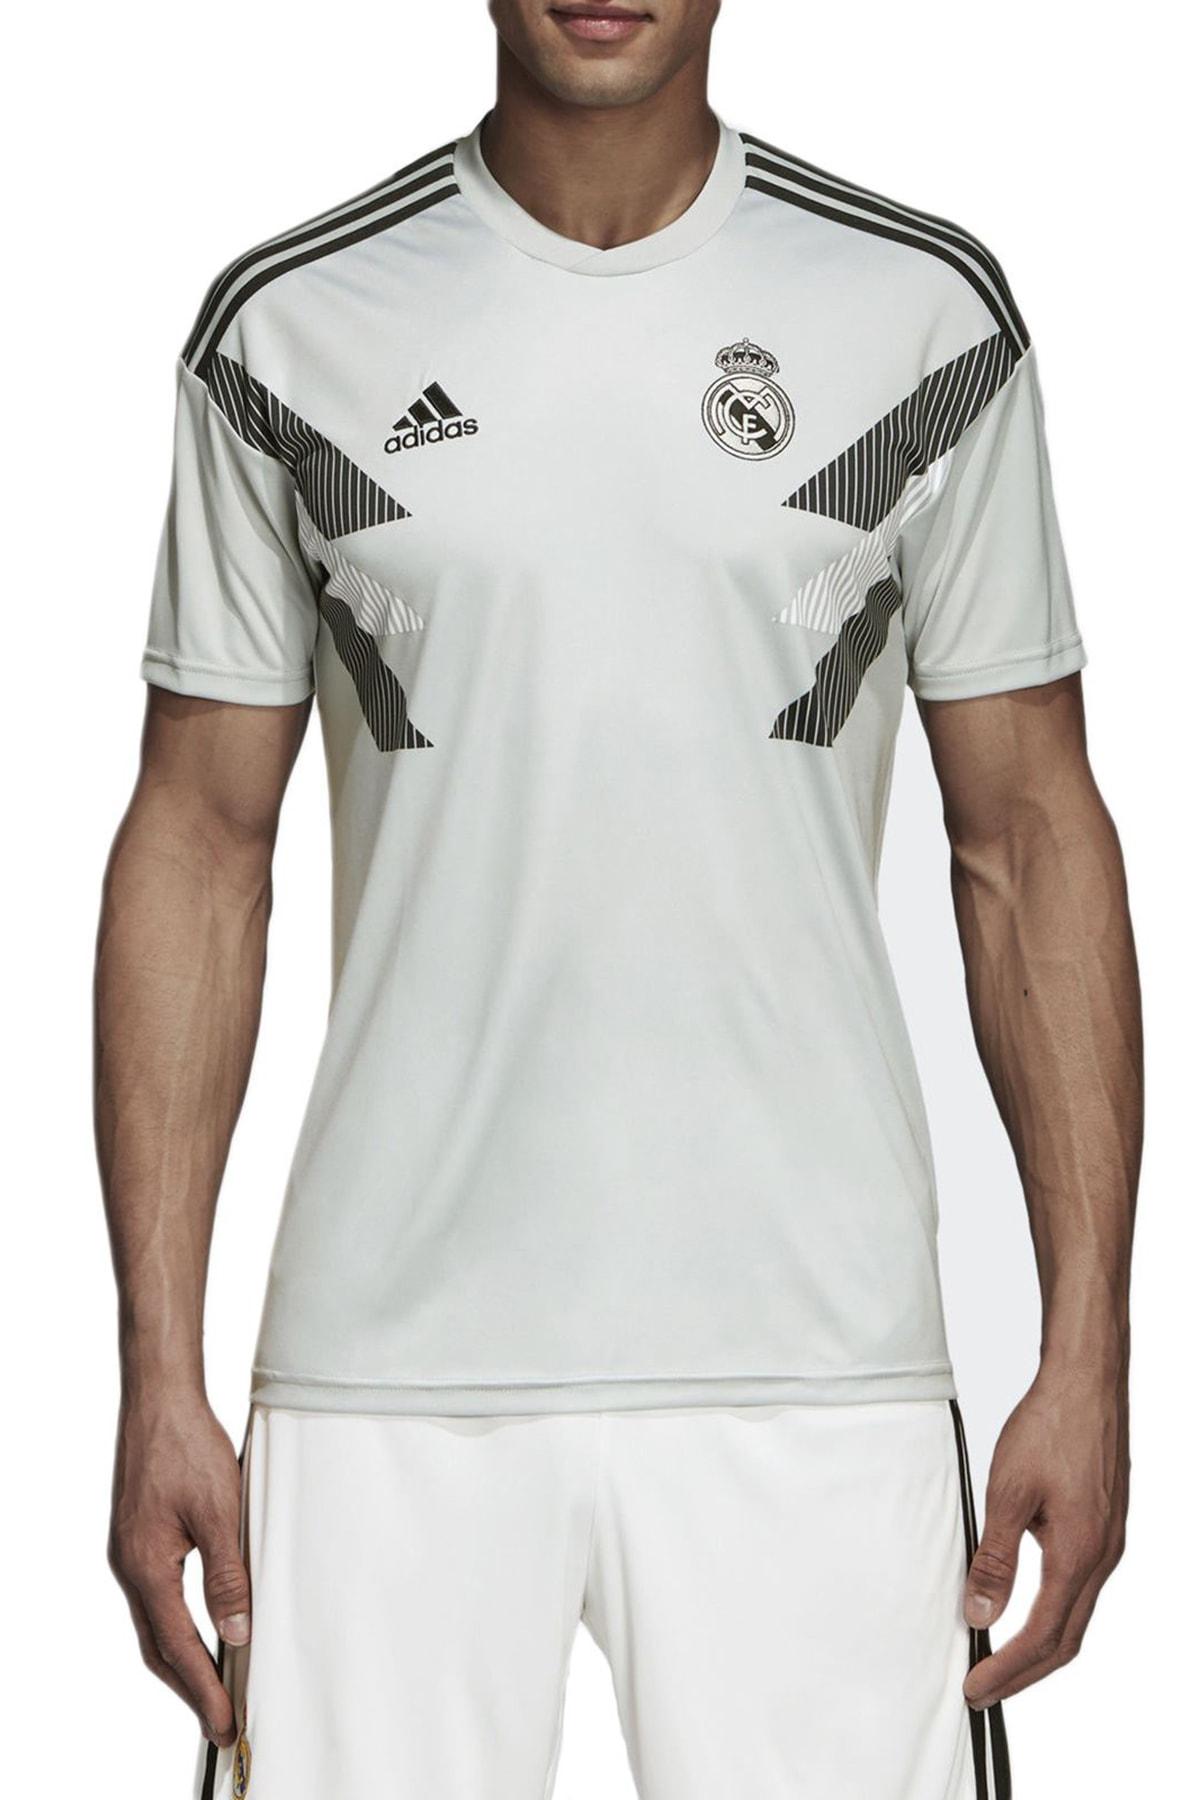 adidas Erkek T-shirt - Real Madrid Preshi - CW5826